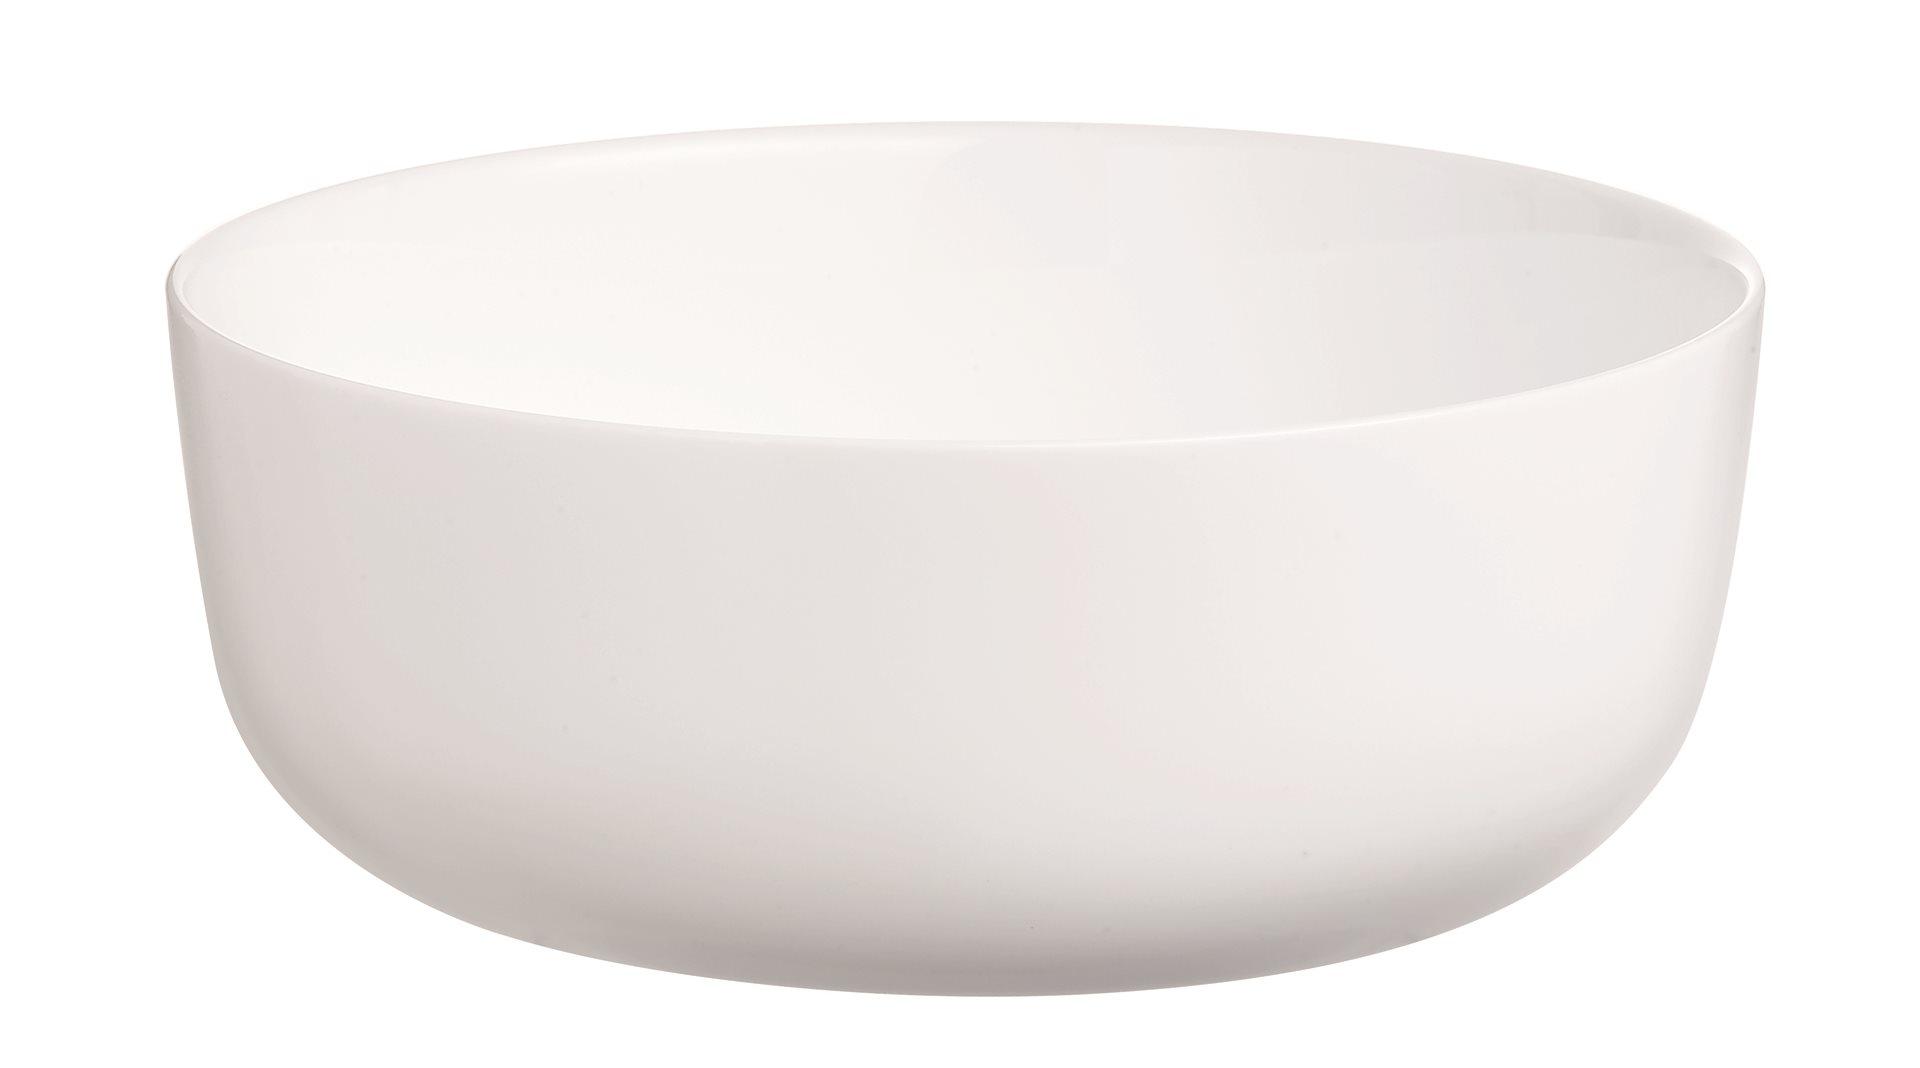 LUMINARC Πυρίμαχο Σκεύος Πορσελάνης 18εκ., 1Lt. Λευκό Diwali - N2945